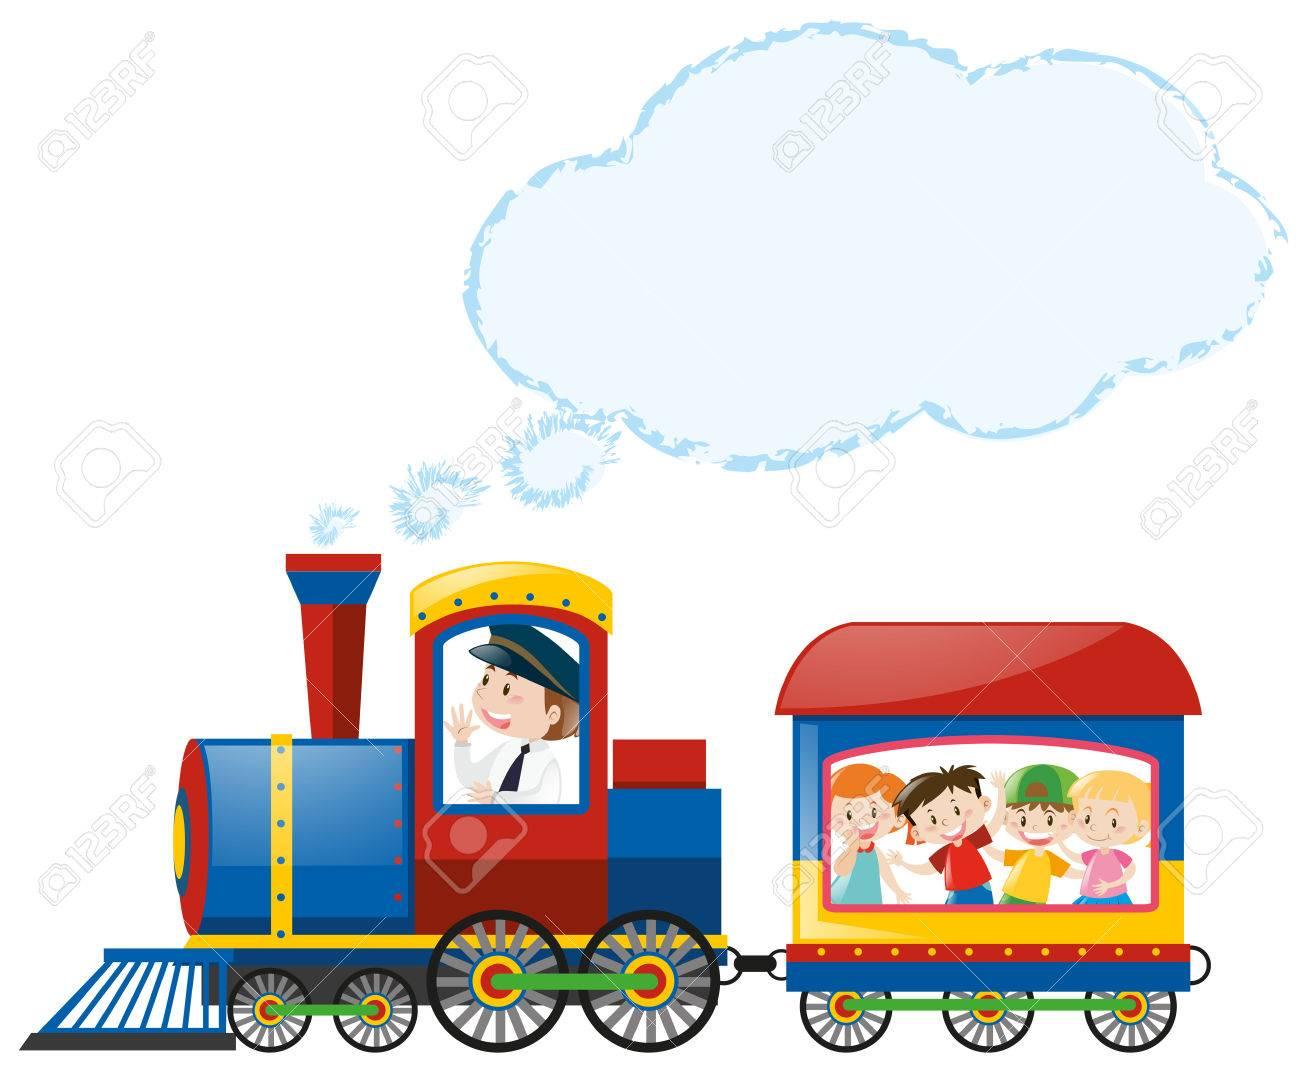 Children riding on train illustration - 80862663